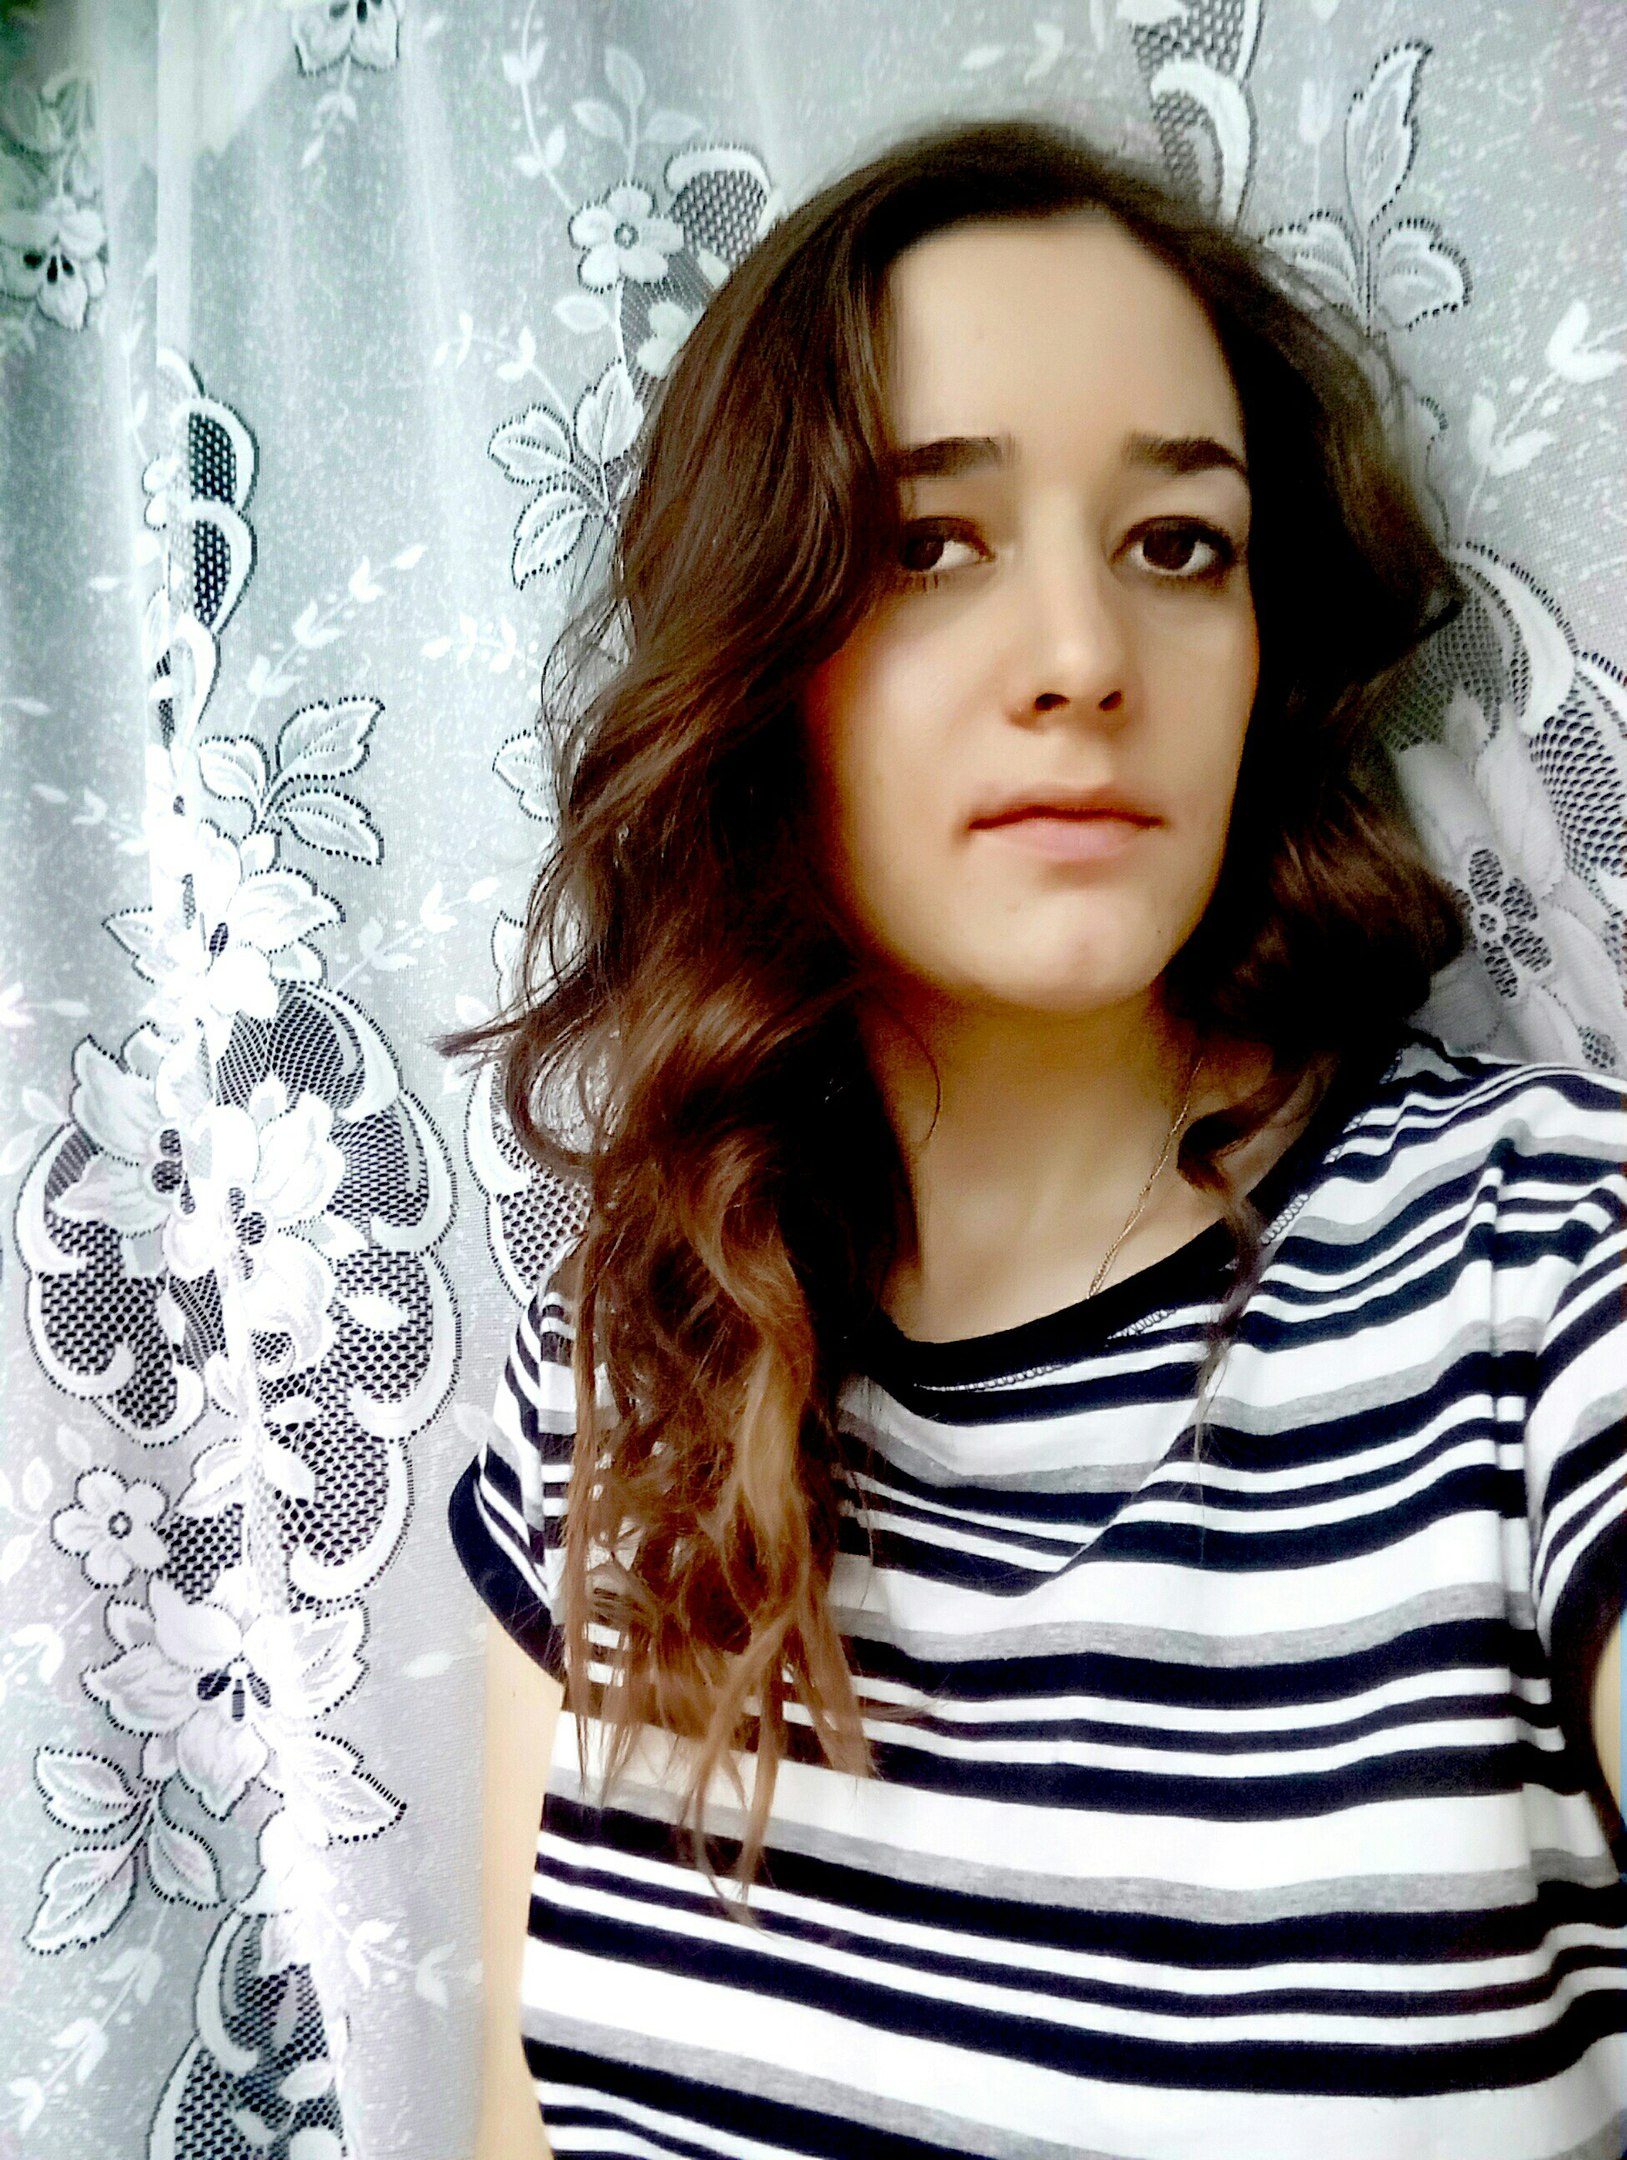 Ksenia, 22, Kazan